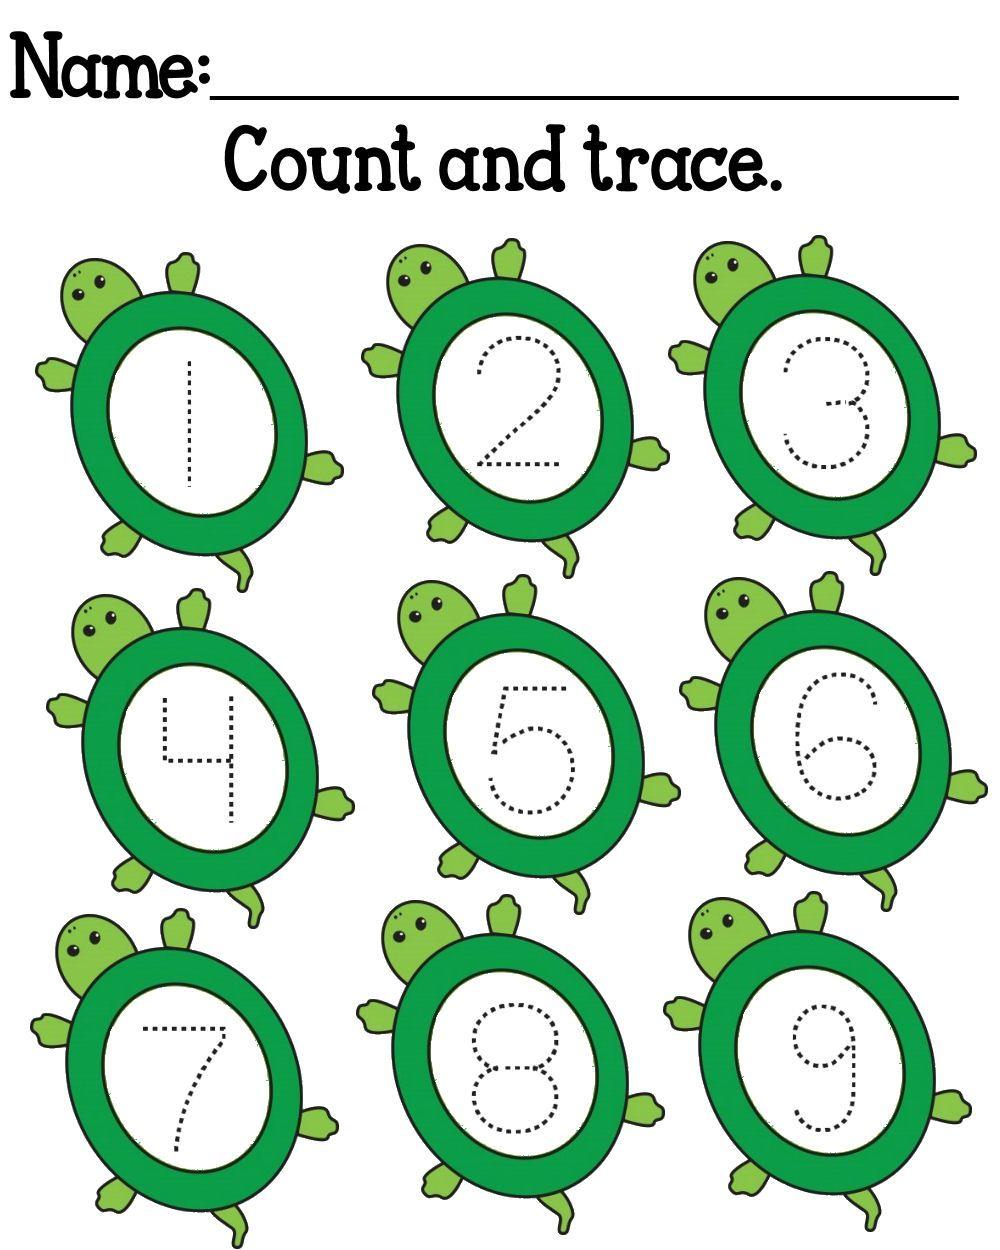 Free Yertle The Turtle Printables | Mysunwillshine | Reptile And - Free Printable Reptile Worksheets